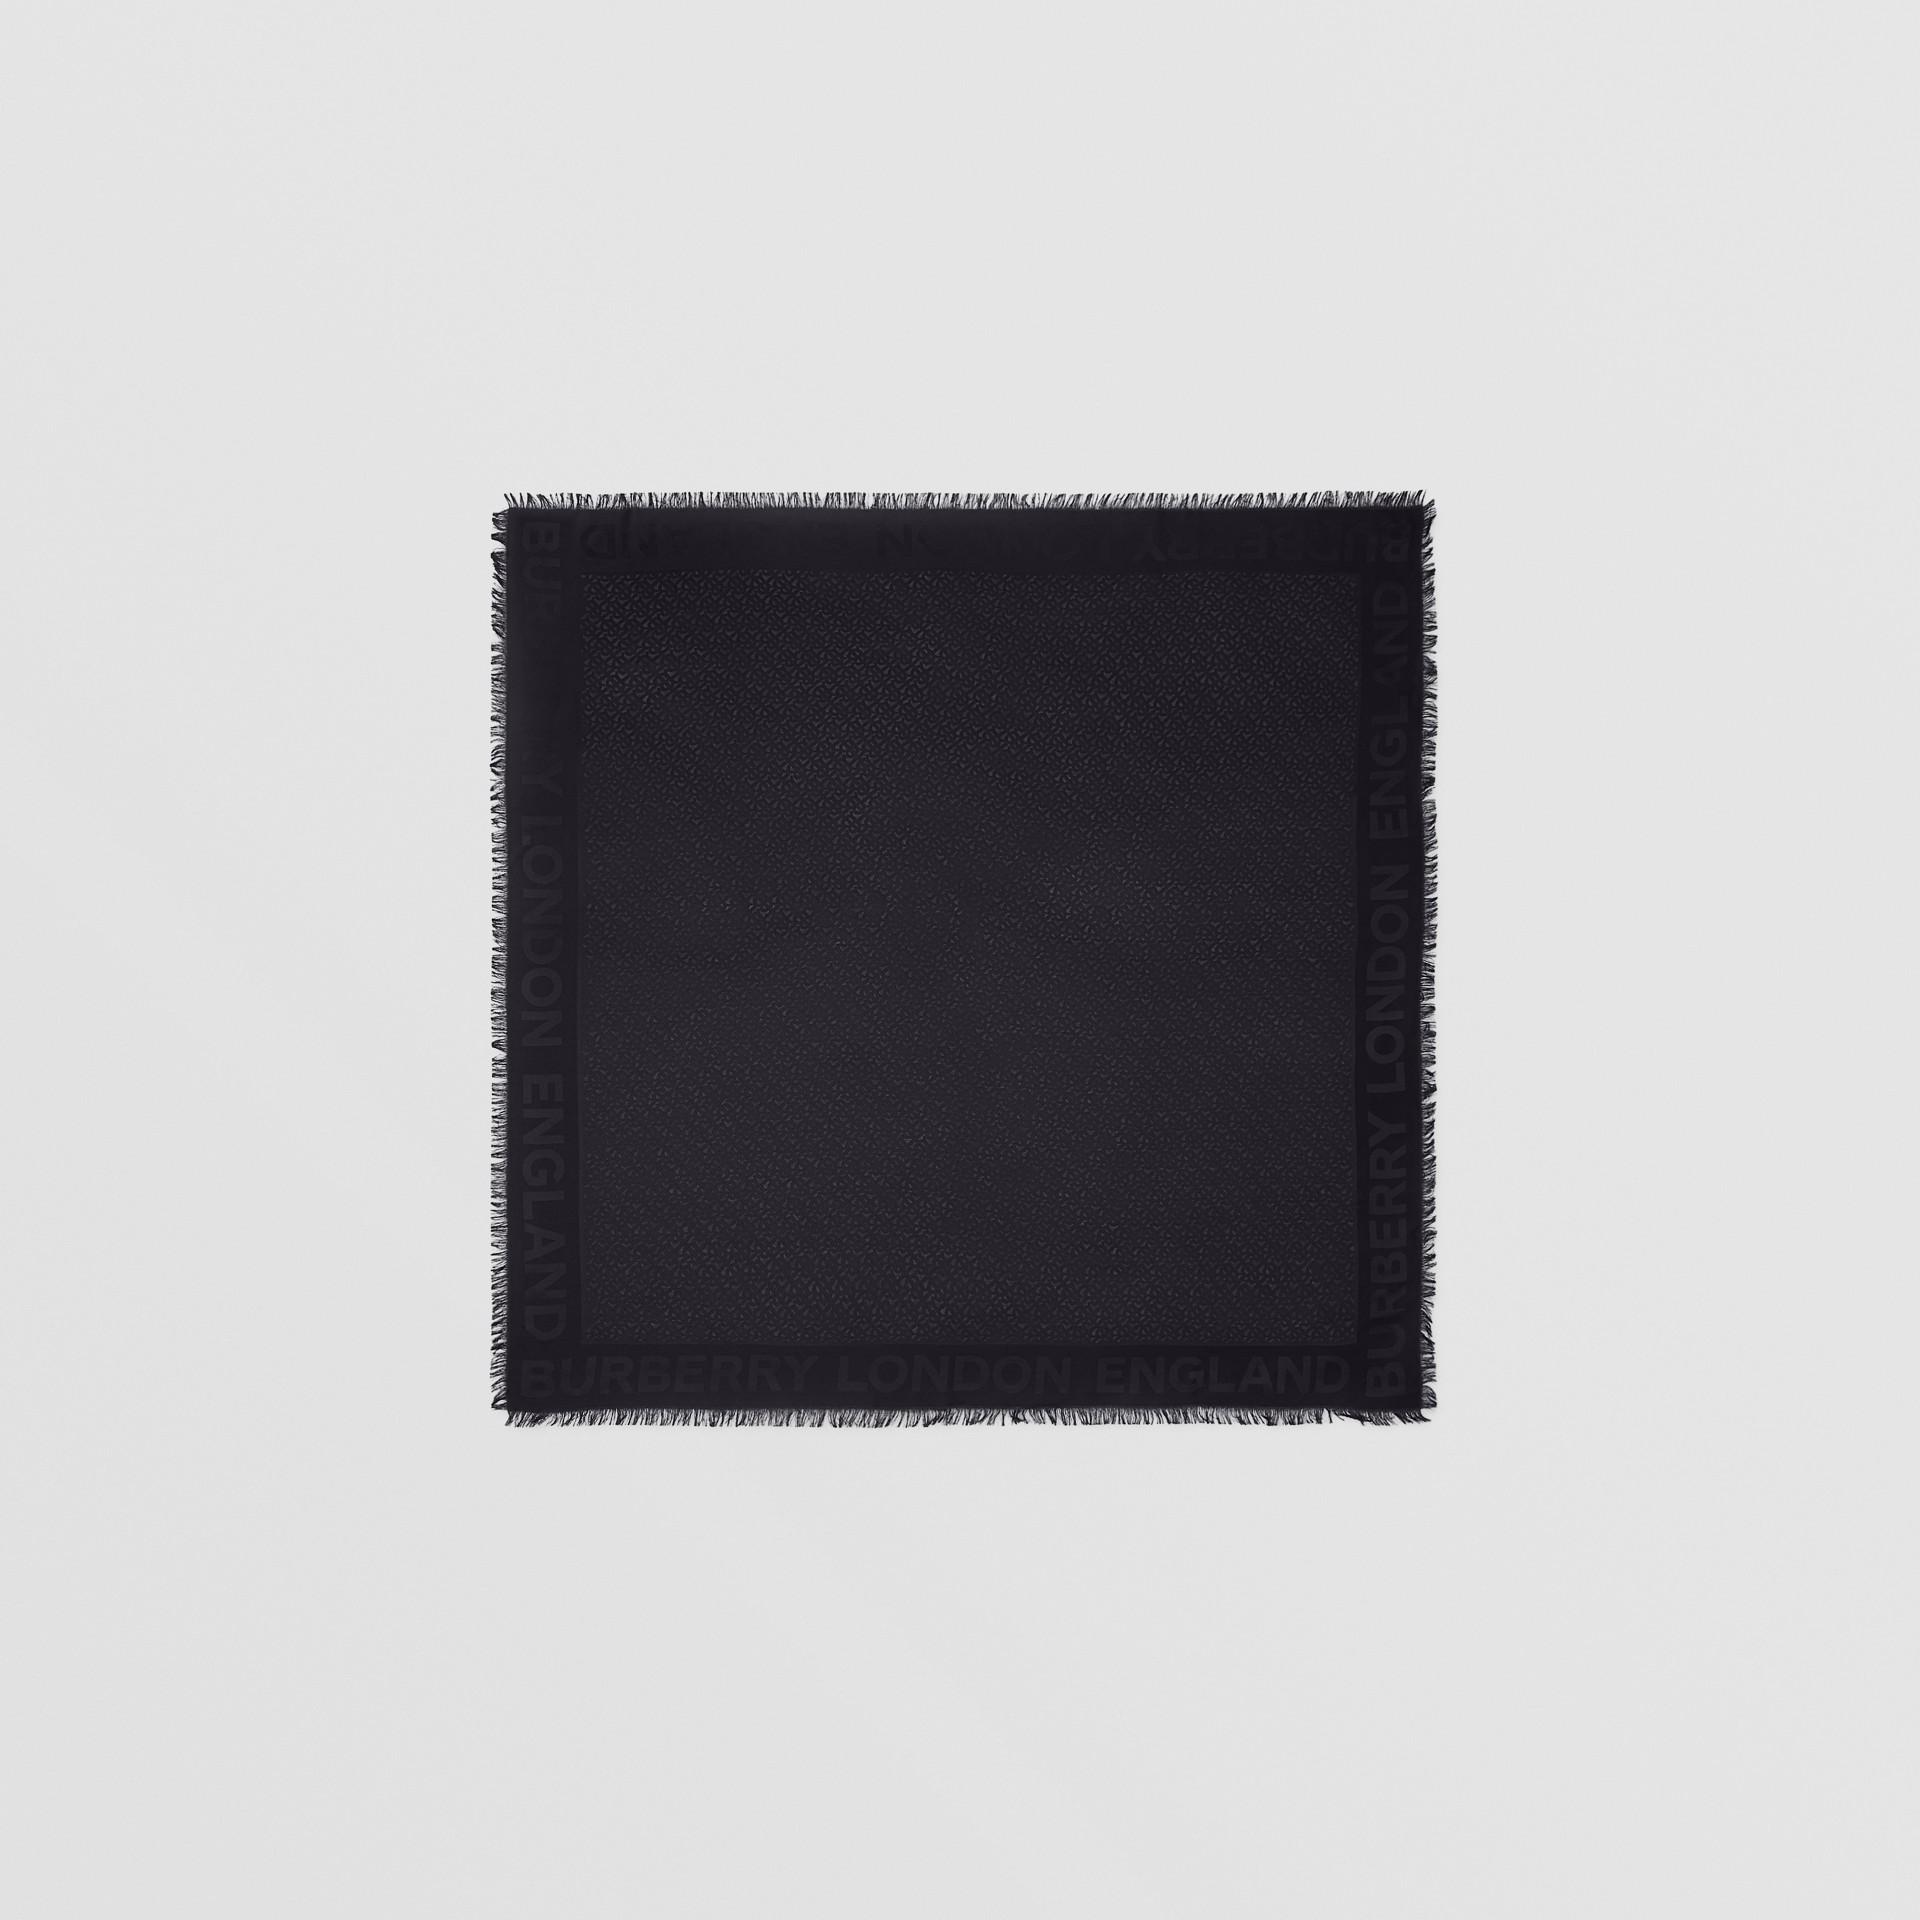 Monogram Silk Wool Jacquard Large Square Scarf in Black | Burberry - gallery image 0